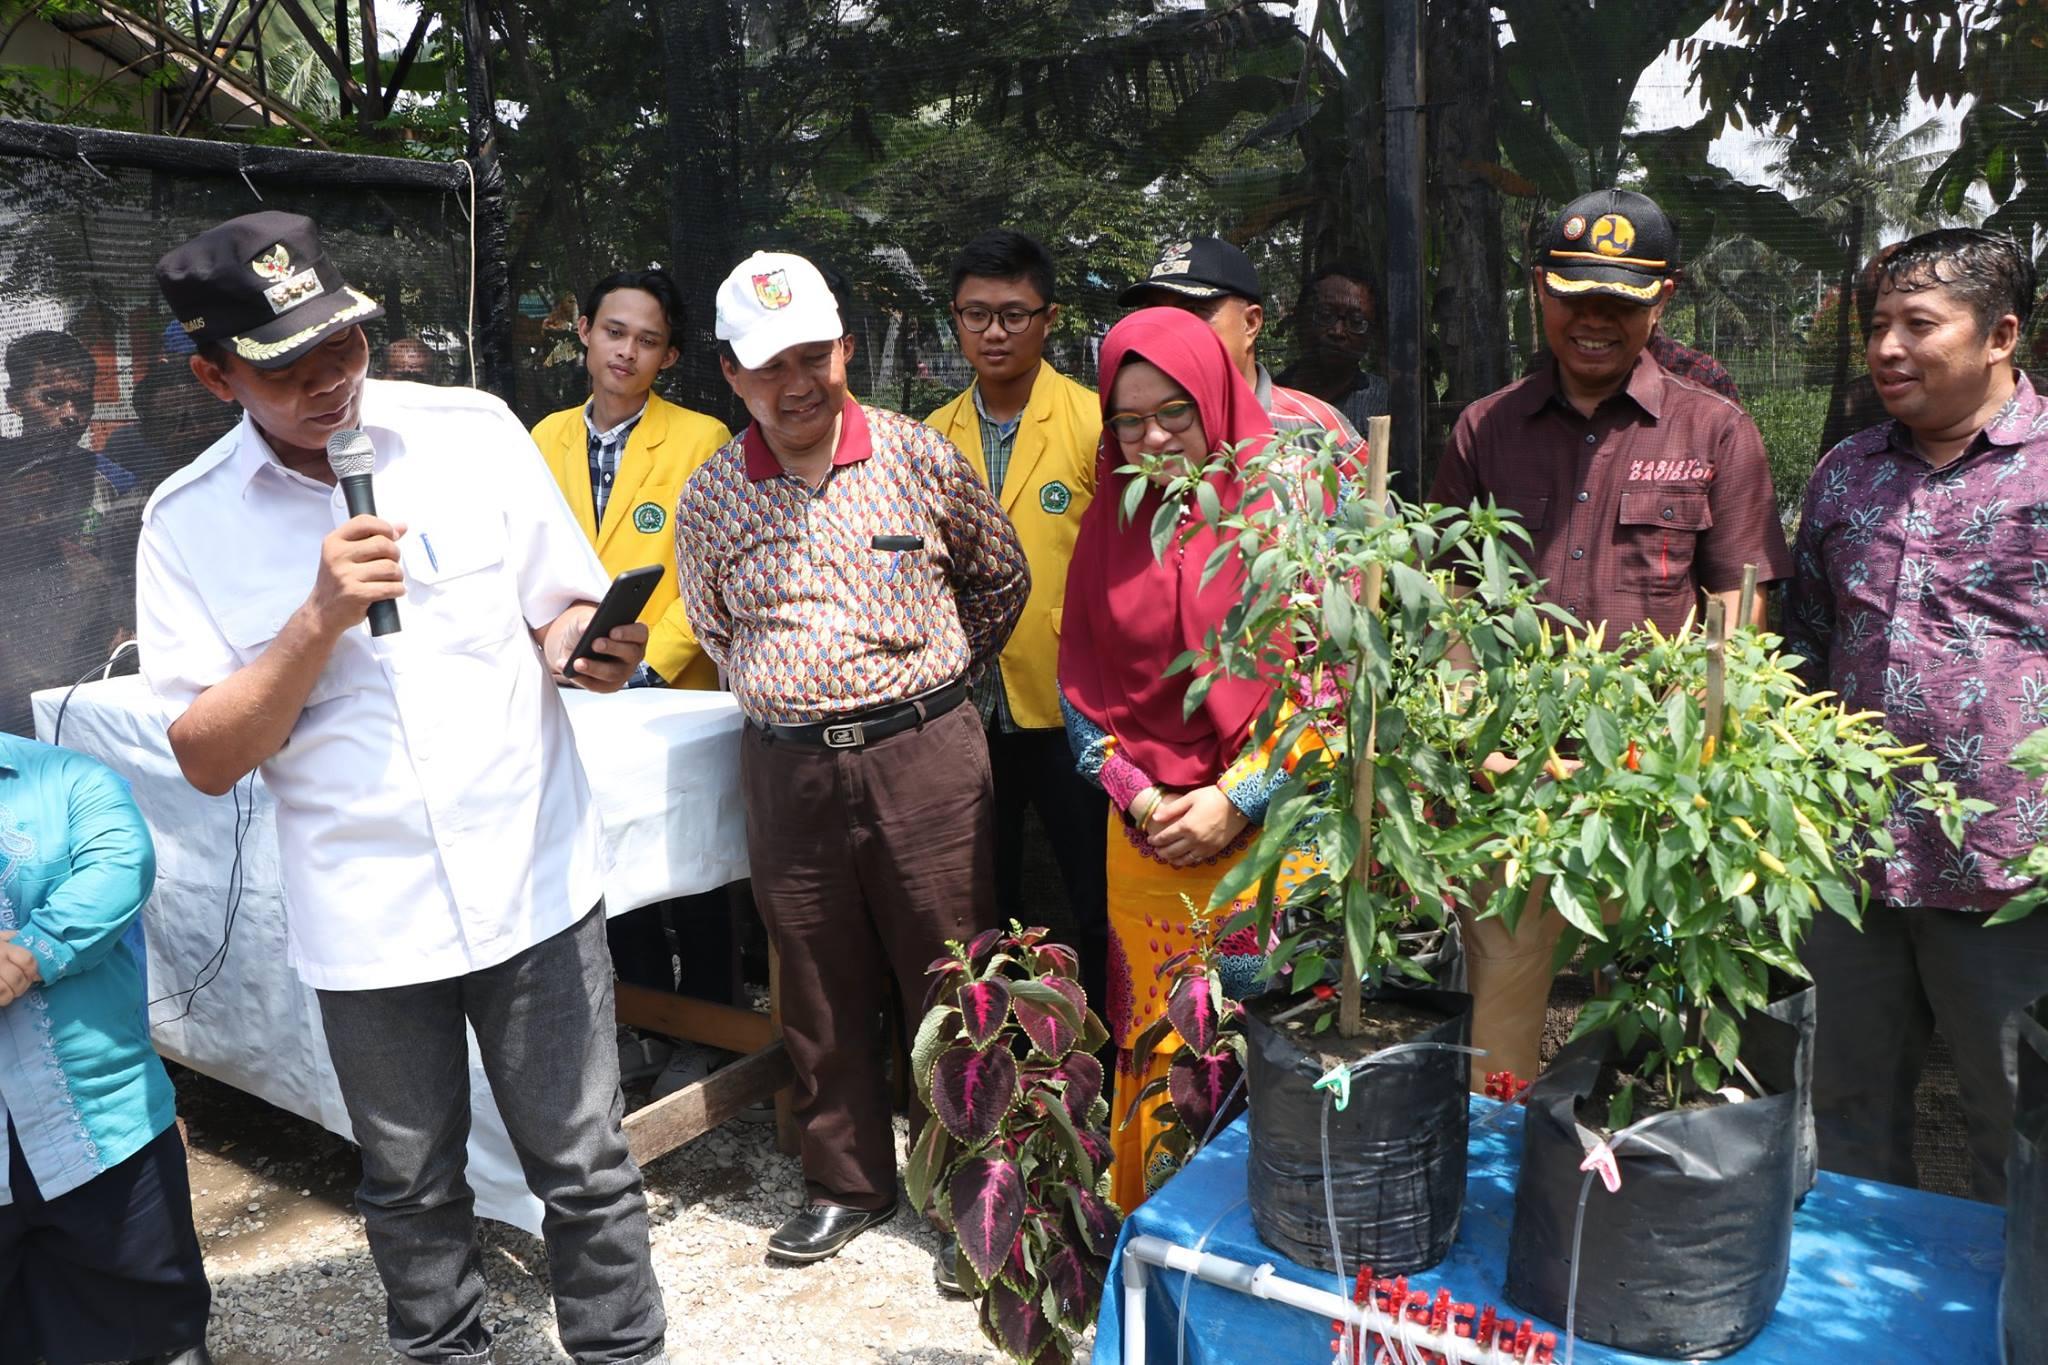 Wali Kota Panen Pedet dan Launching Agrotek Farm System di Kelurahan Agrowisata